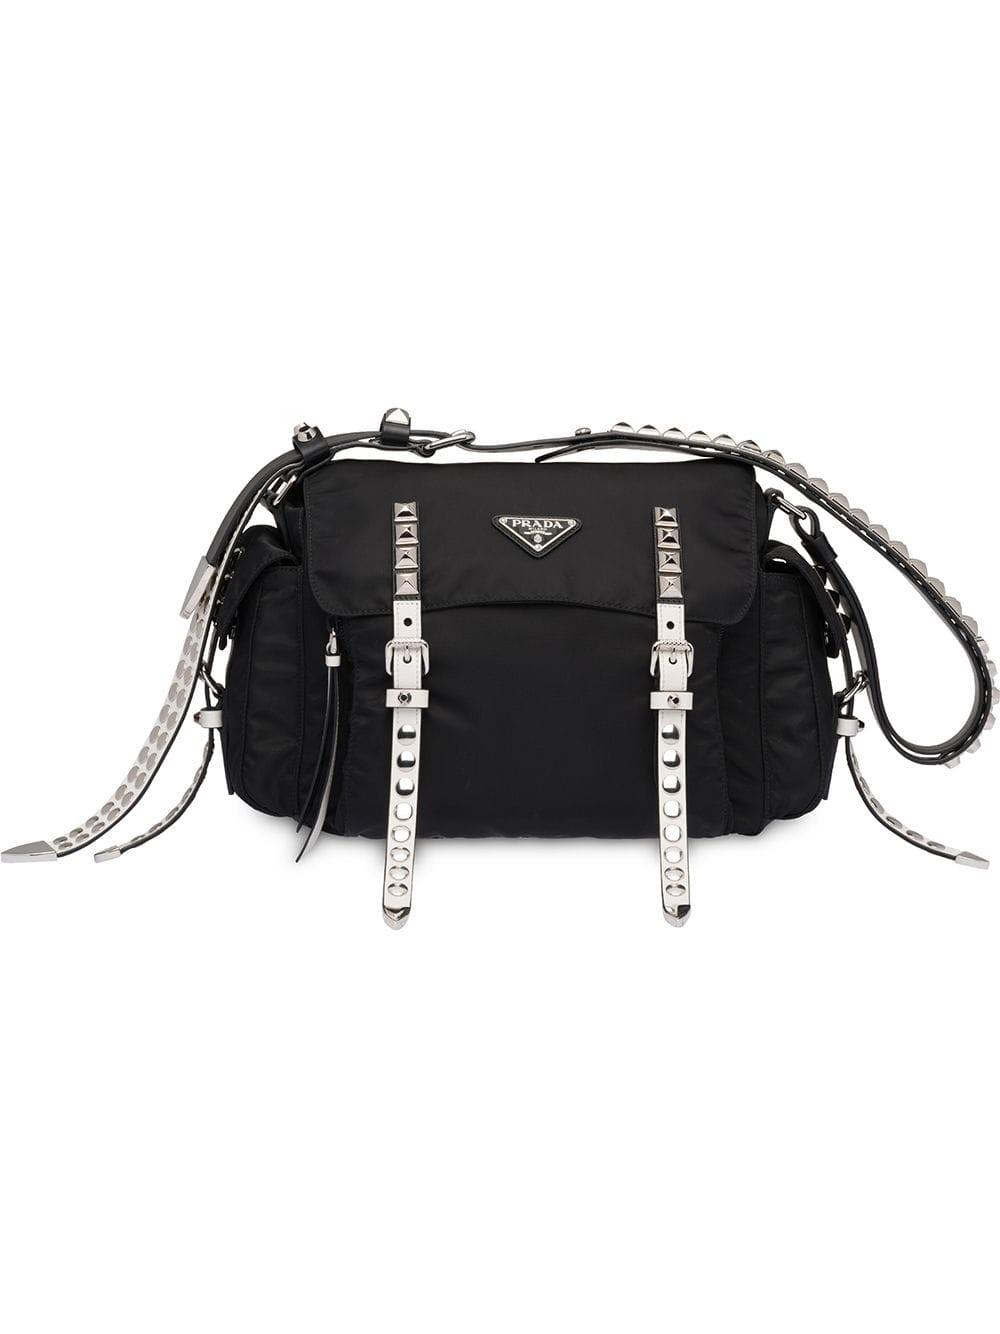 bb34558fd901 prada STUDDED SHOULDER BAG available on montiboutique.com - 26753